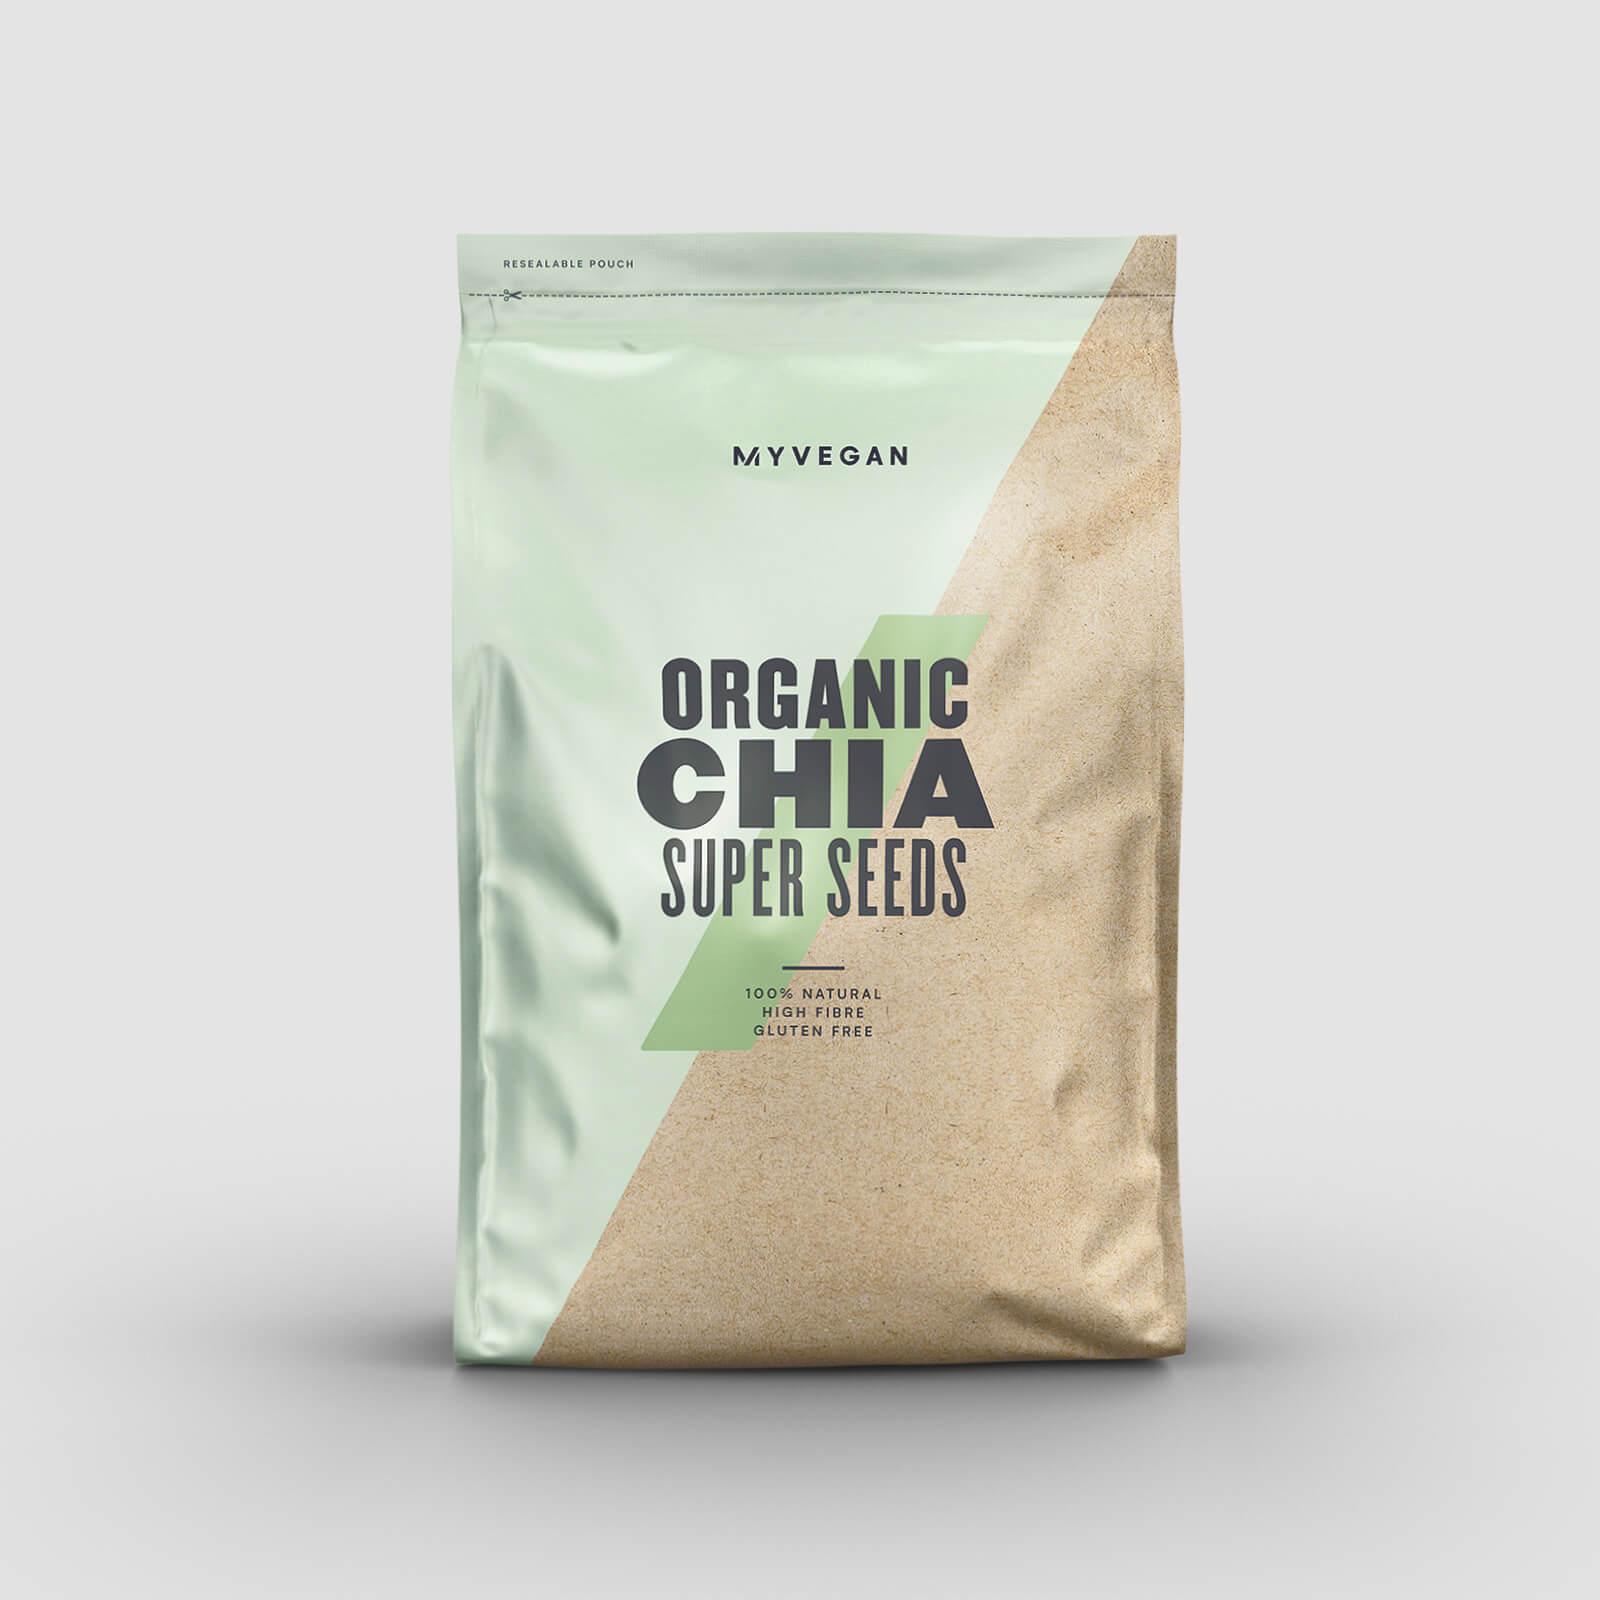 Myprotein Graines de chia bio - 300g - Sans arôme ajouté